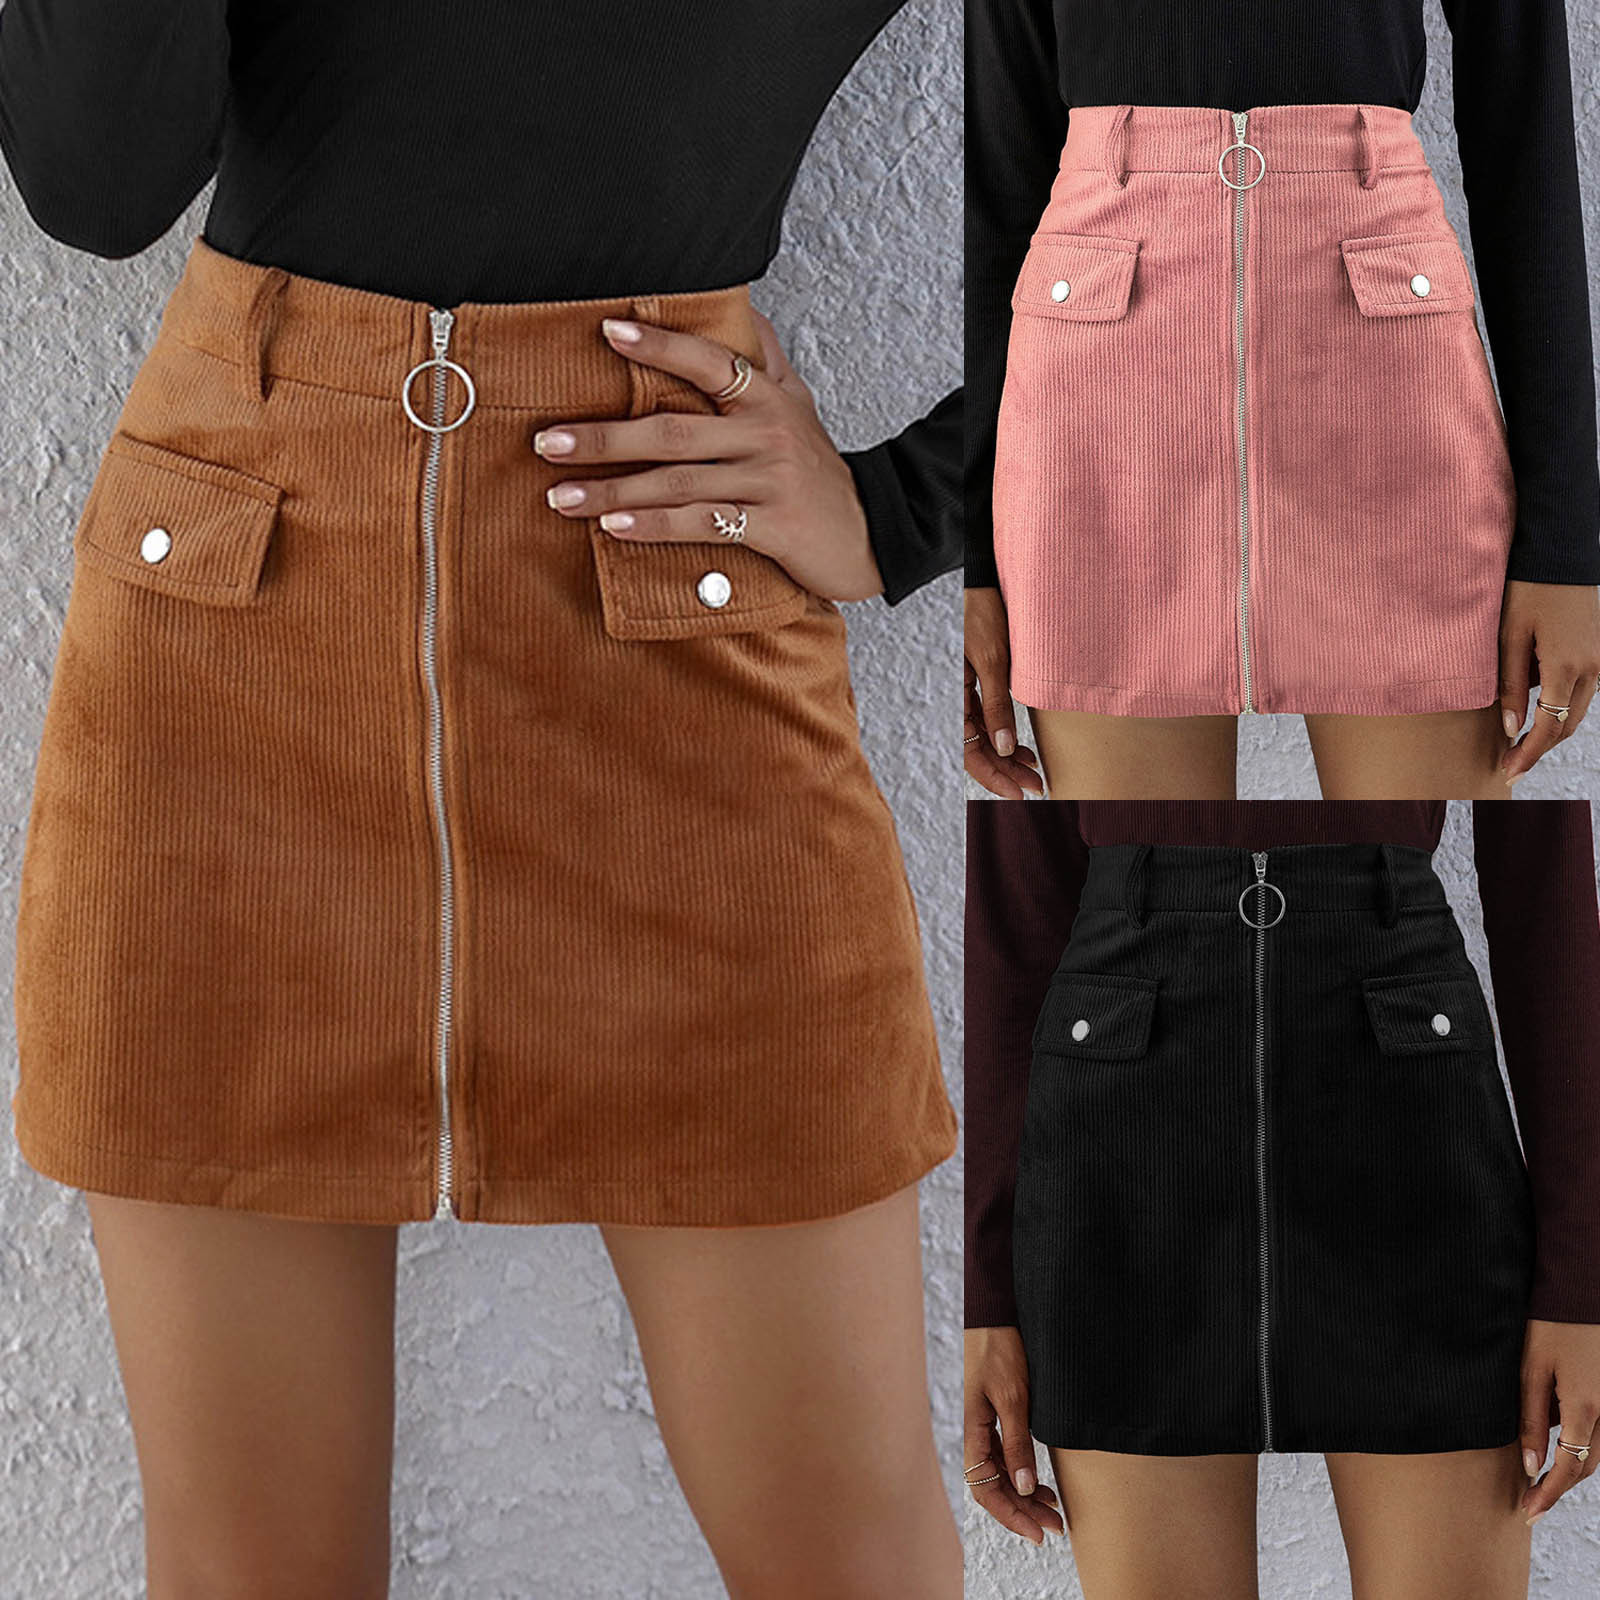 High waist solid color zipper corduroy casual short skirt skirt Women  Corduroy Zipper High Waist Skirt Short Mini Skirt 2021